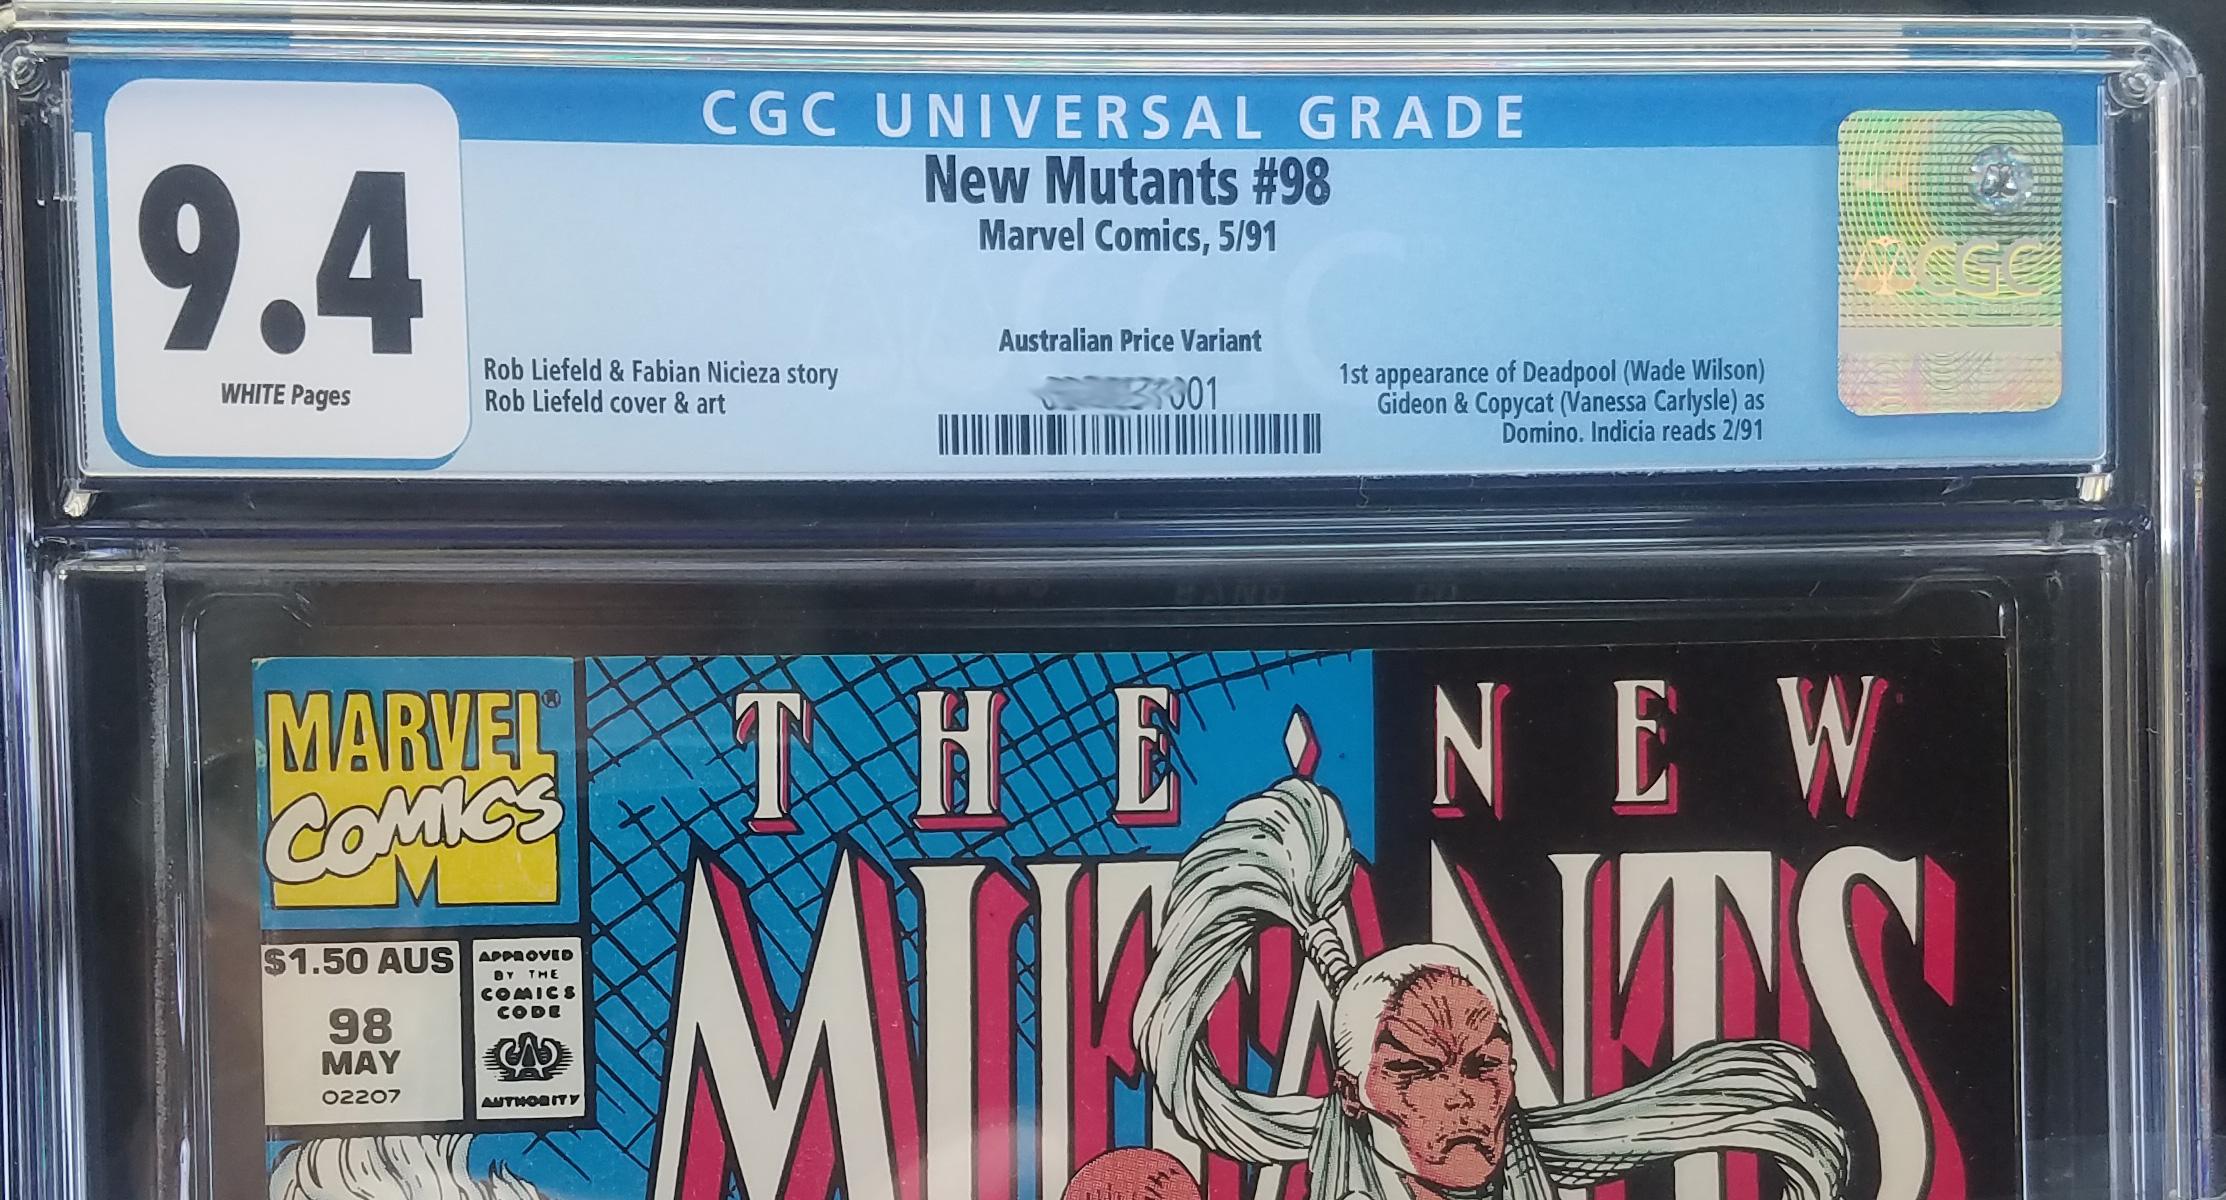 australian-price-variant-cgc-label